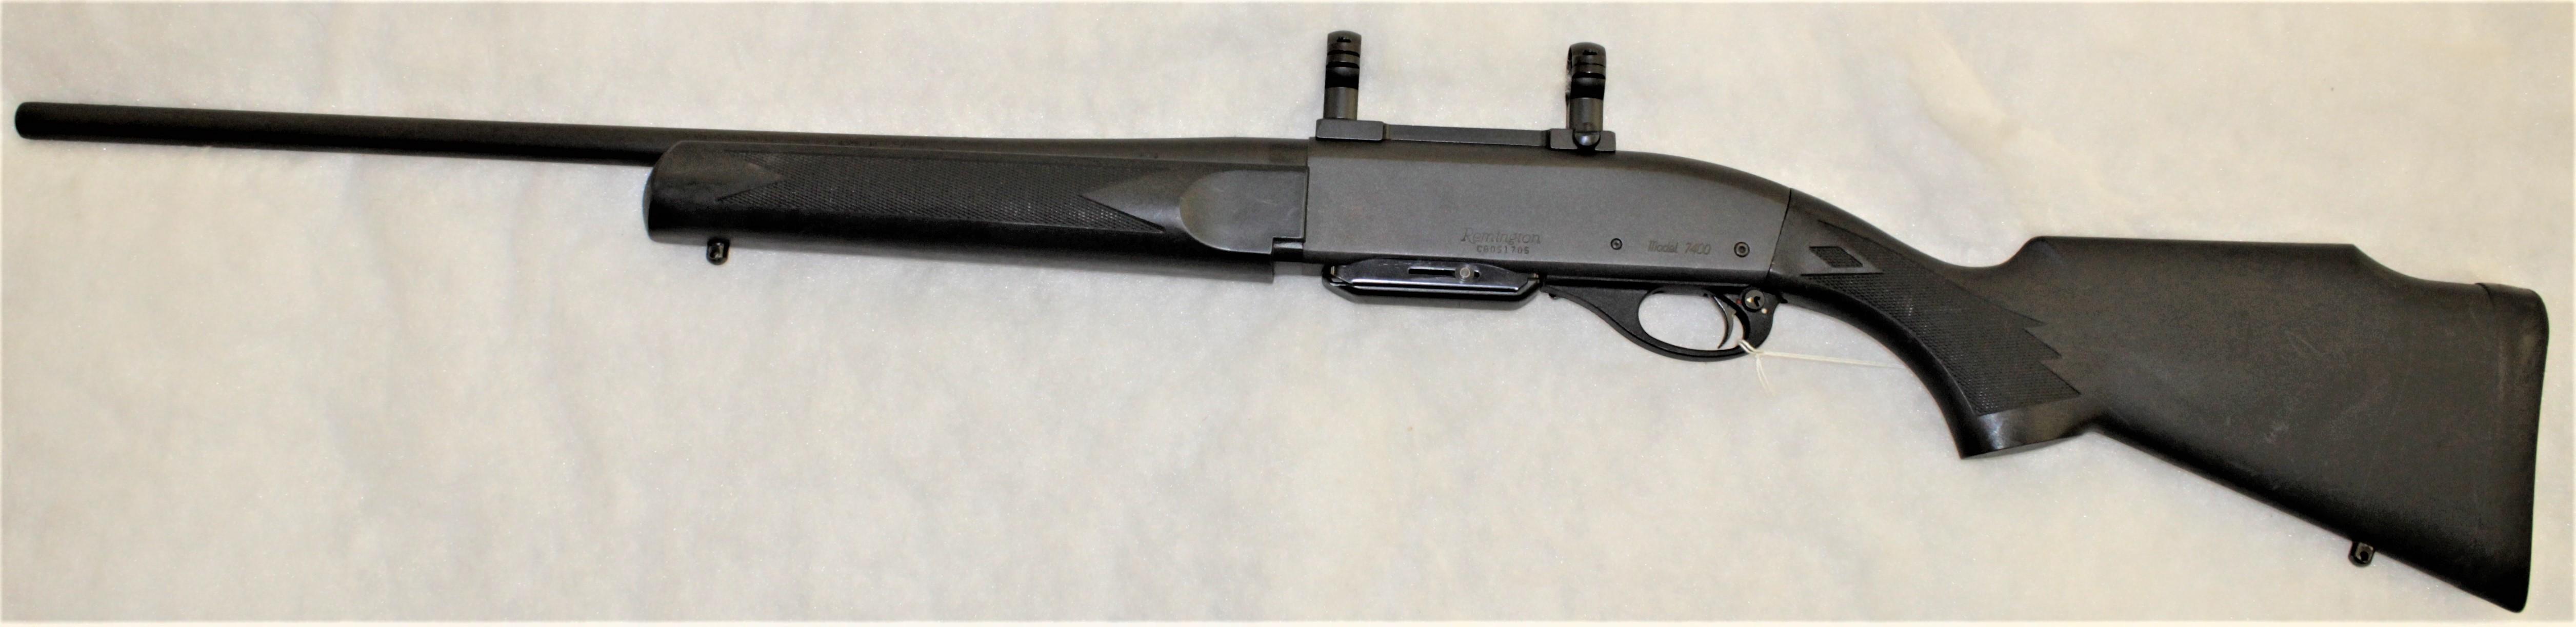 REMINGTON - MODEL 7400 - RIFLE